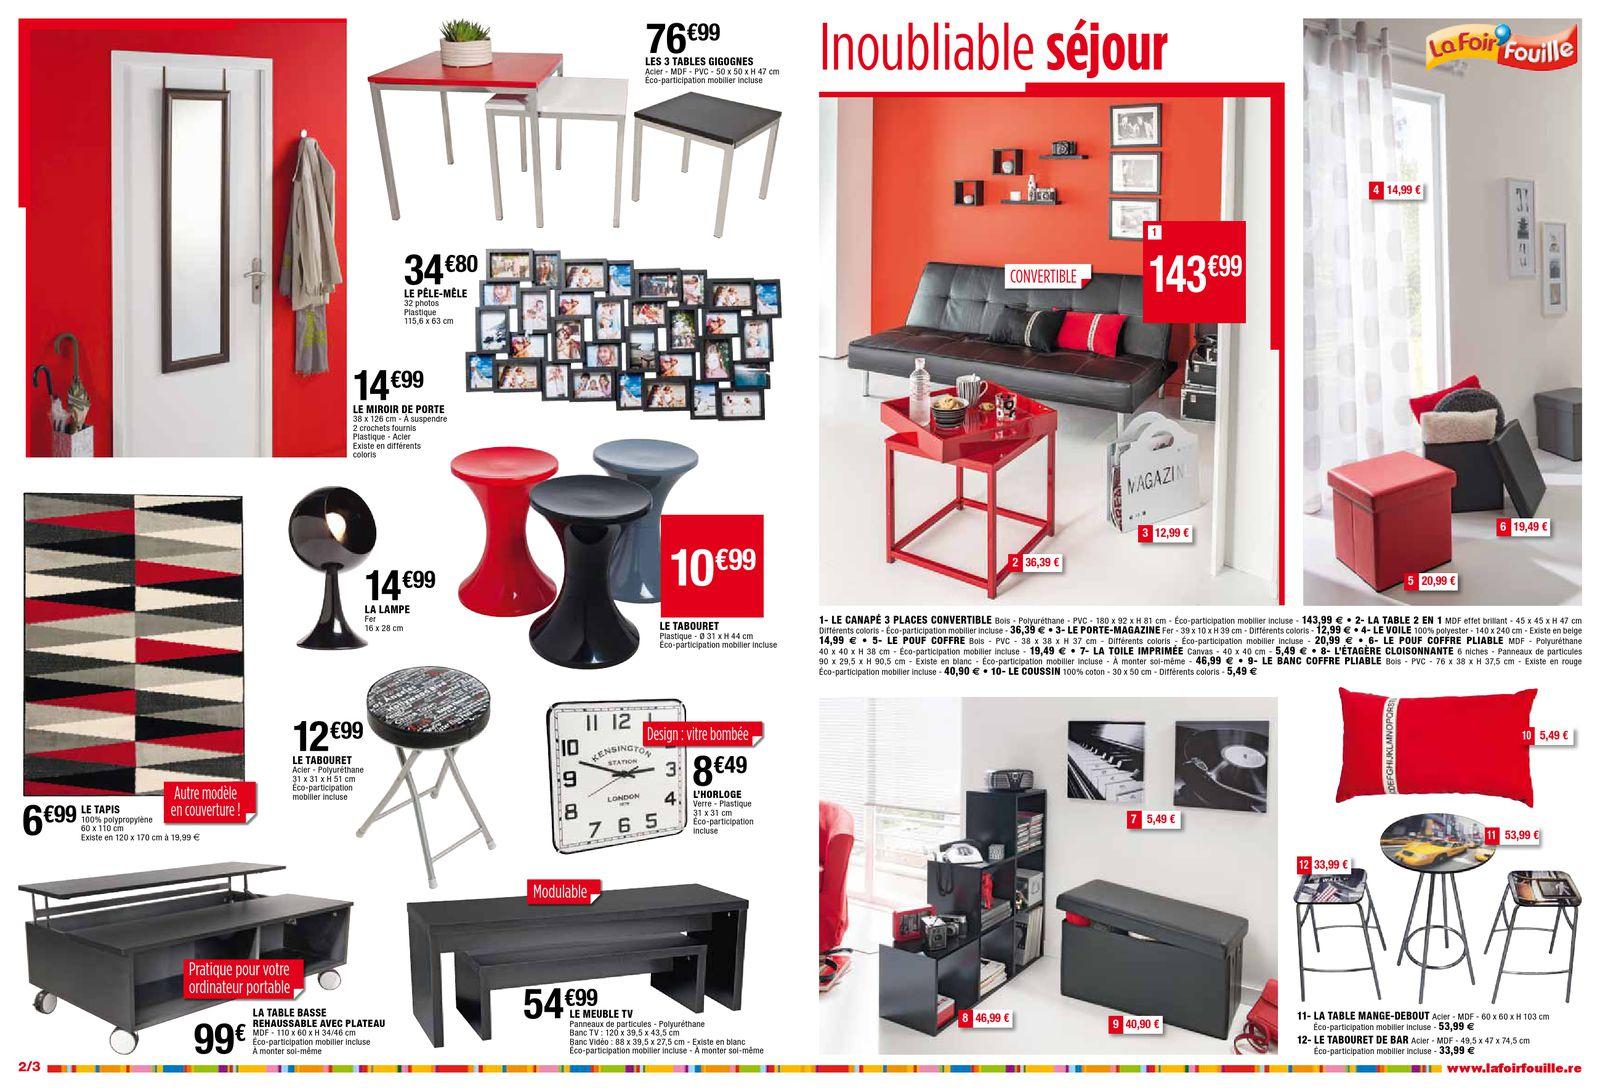 Catalogue La Foir Fouille Douceur Dco Joe Monroe Issuu Dans ... dedans Foir Fouille Salon De Jardin